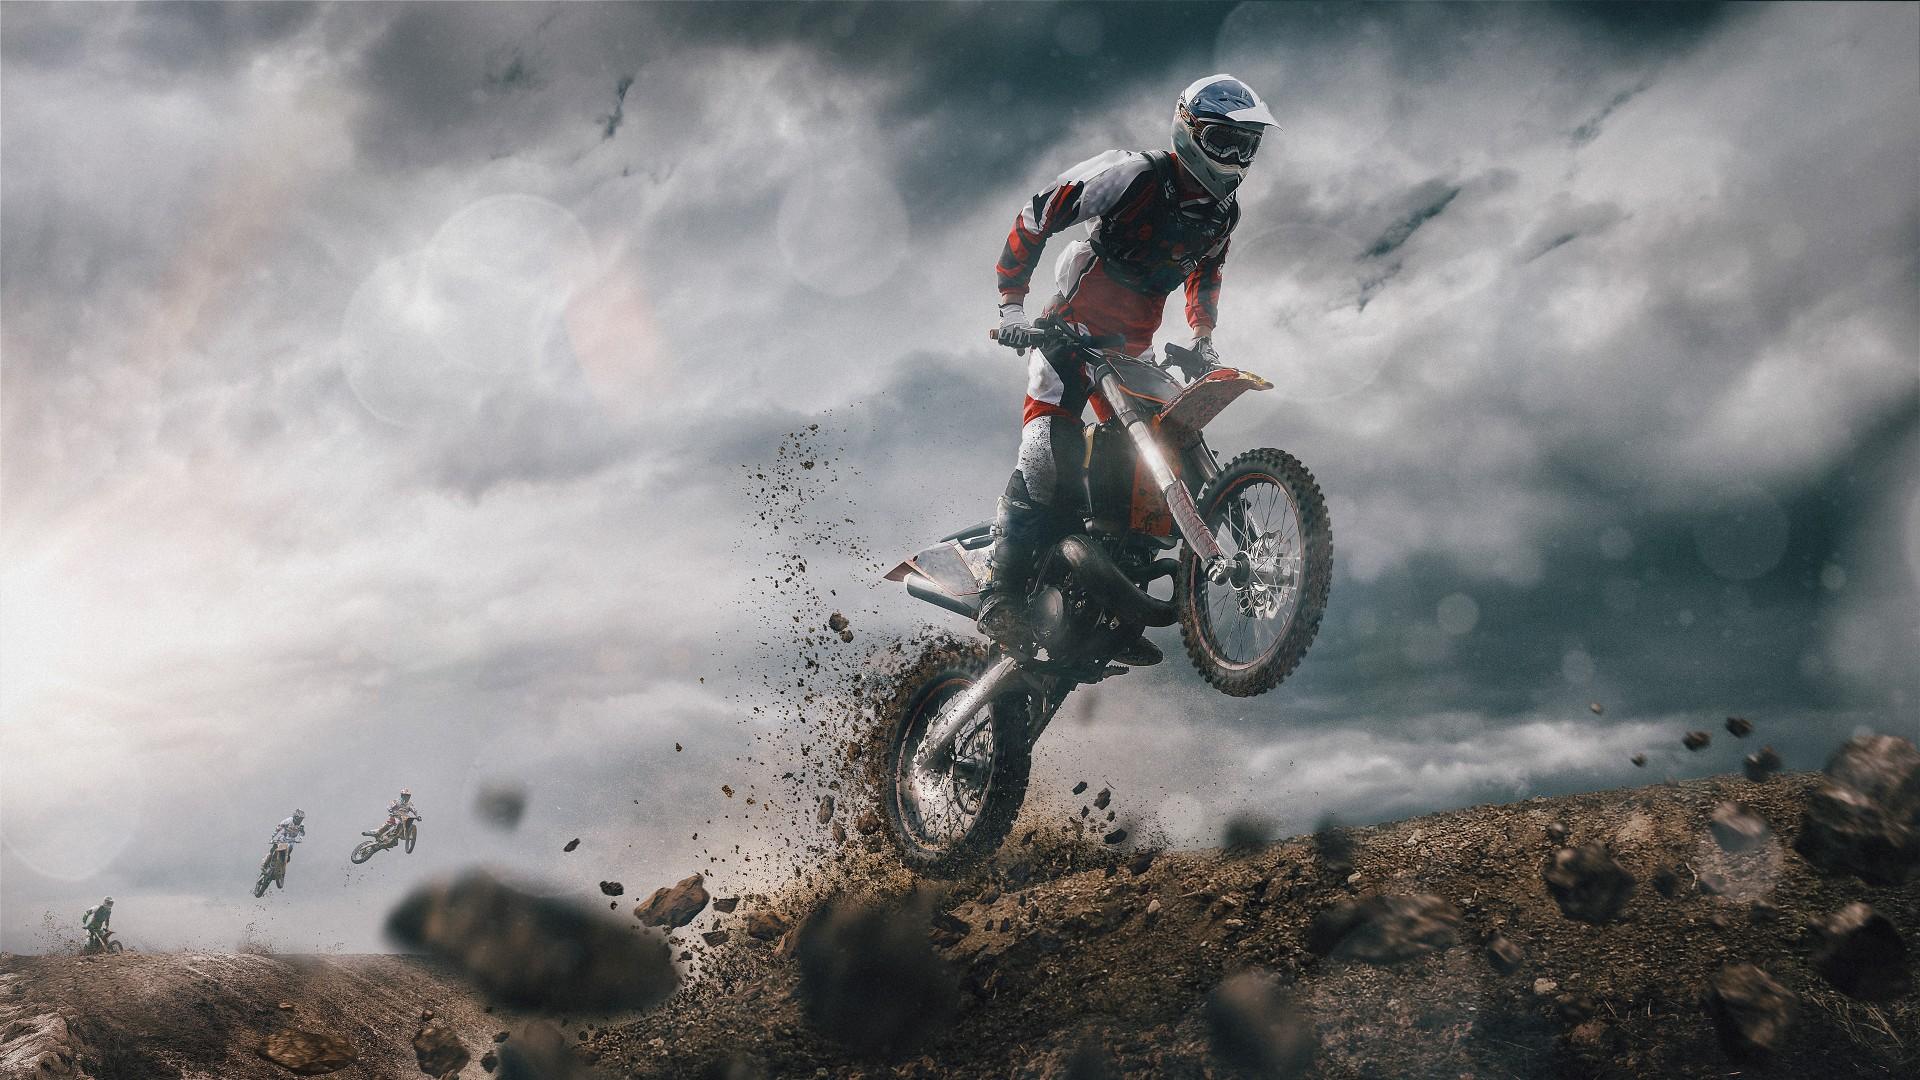 Bike Girl Iphone Wallpaper Motocross 4k Wallpapers Hd Wallpapers Id 22707